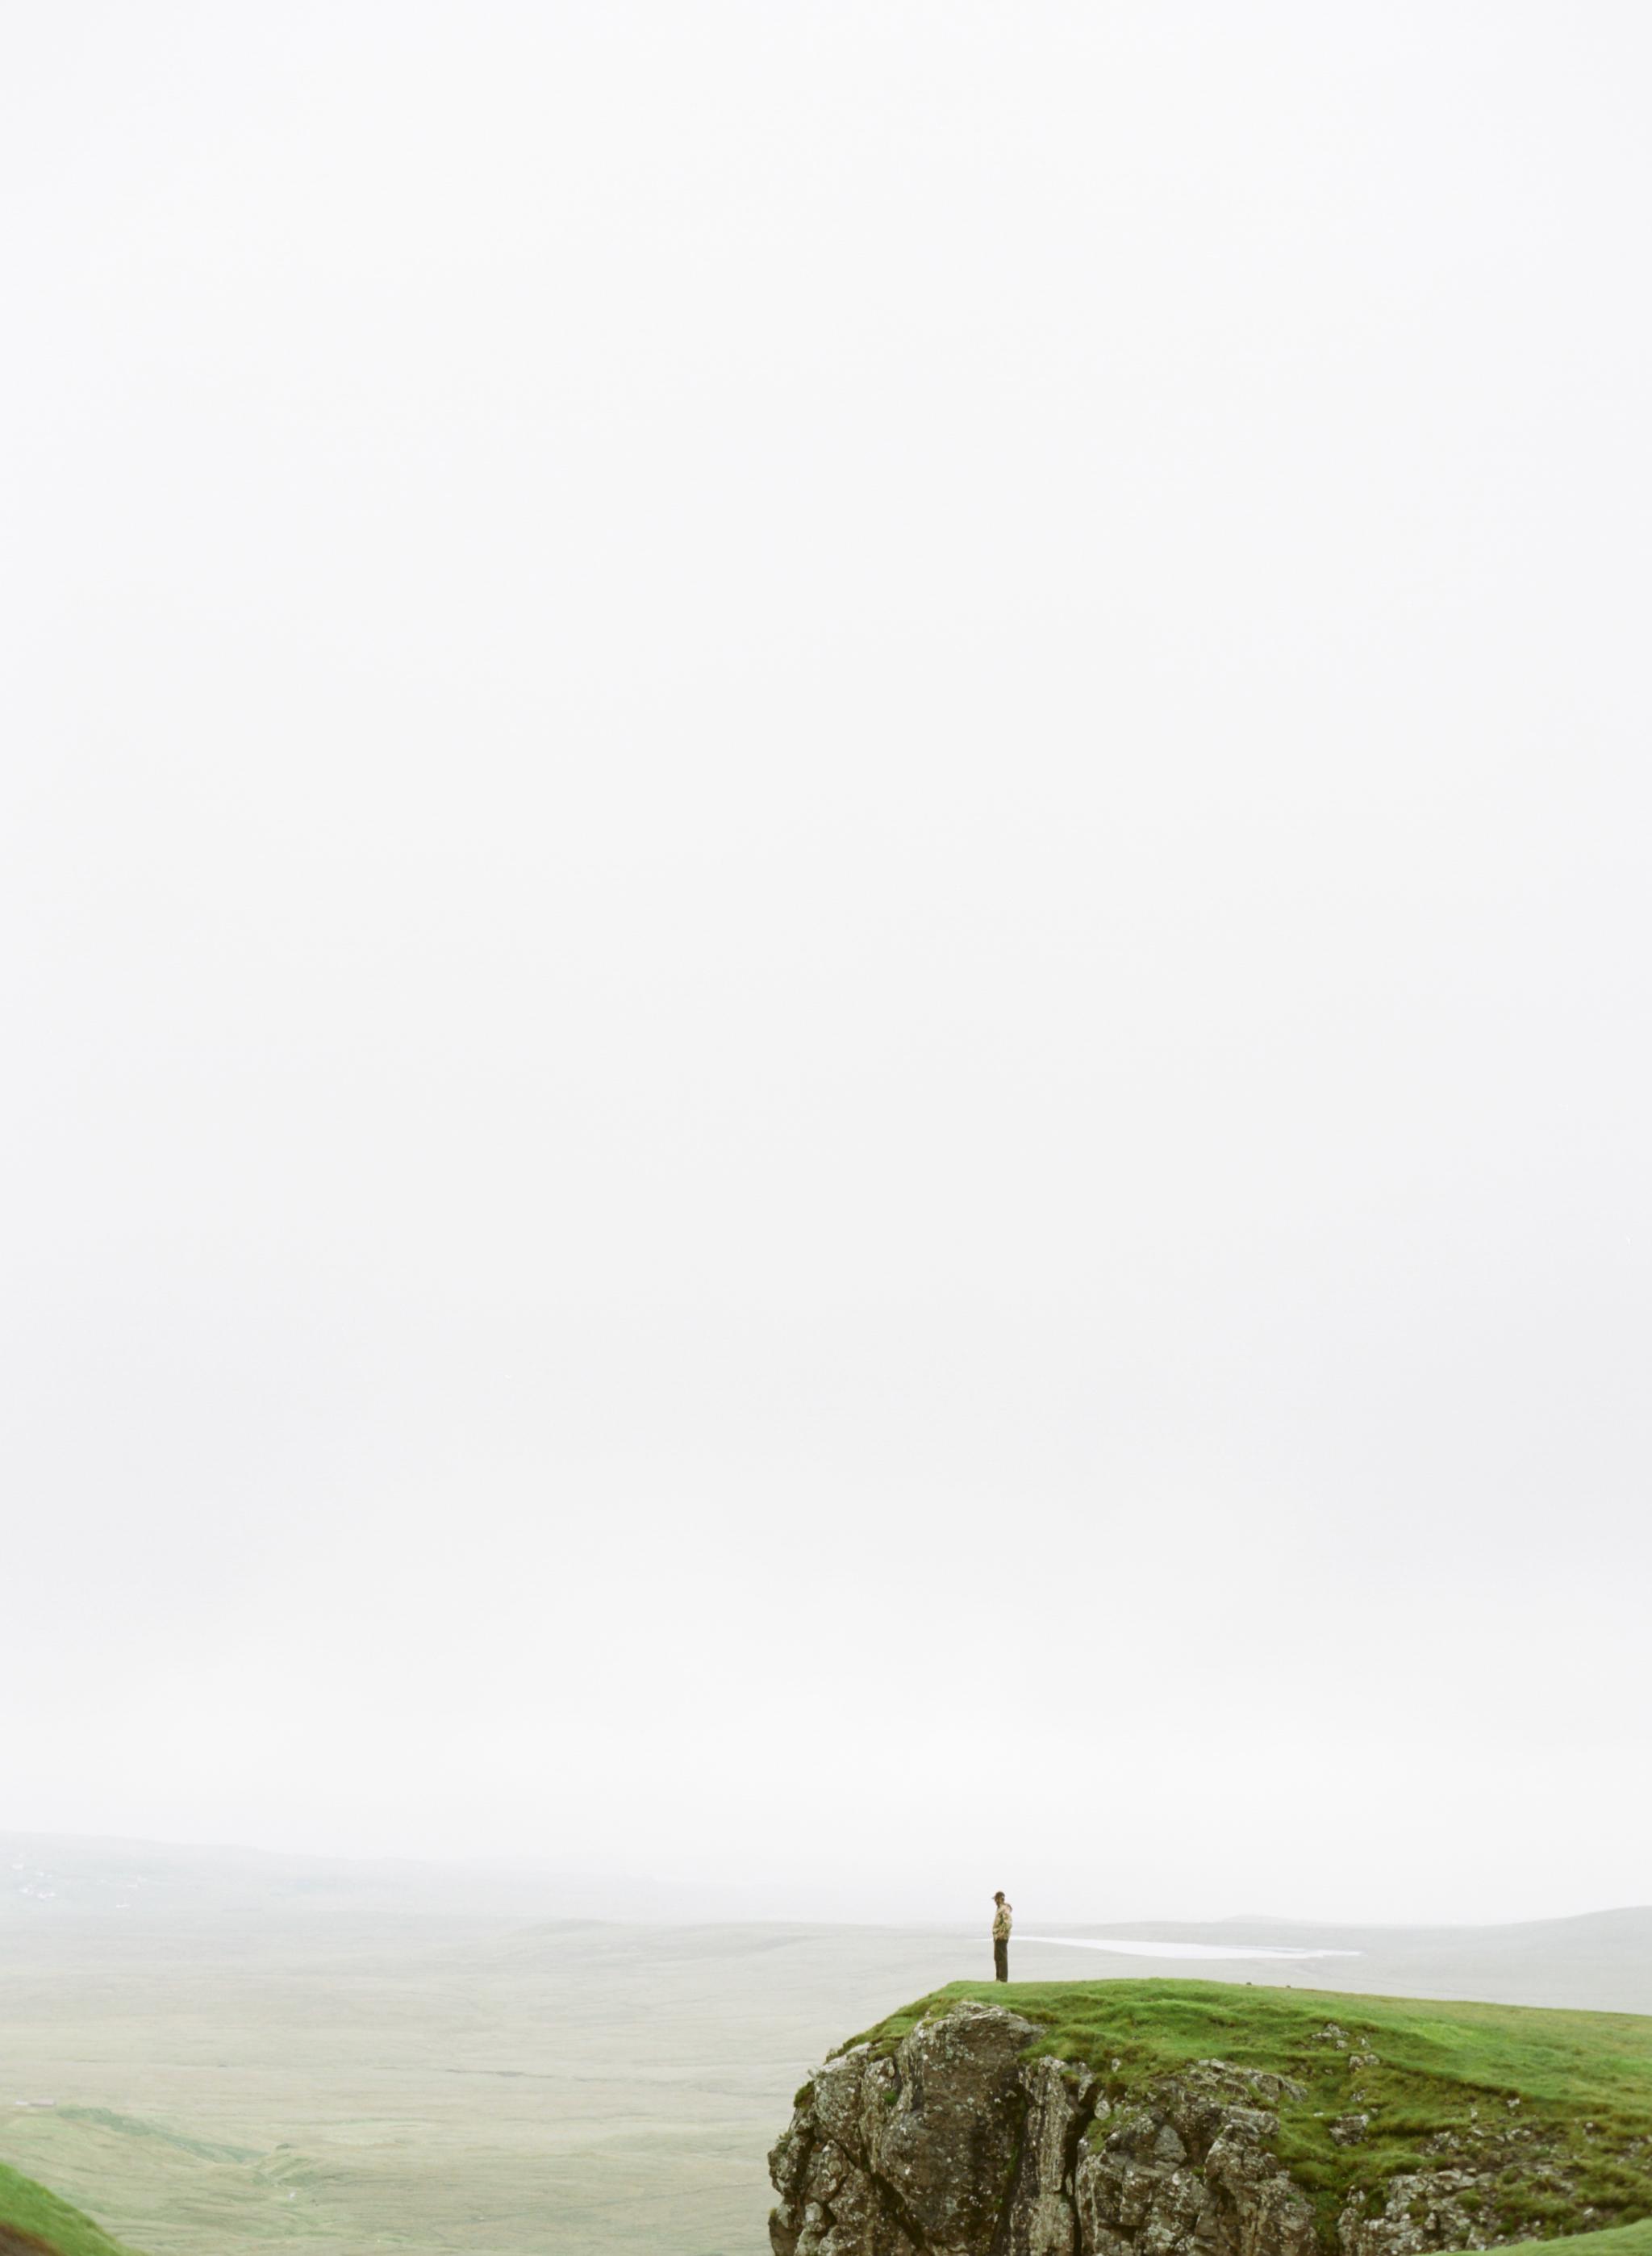 Image by Nina Mullins